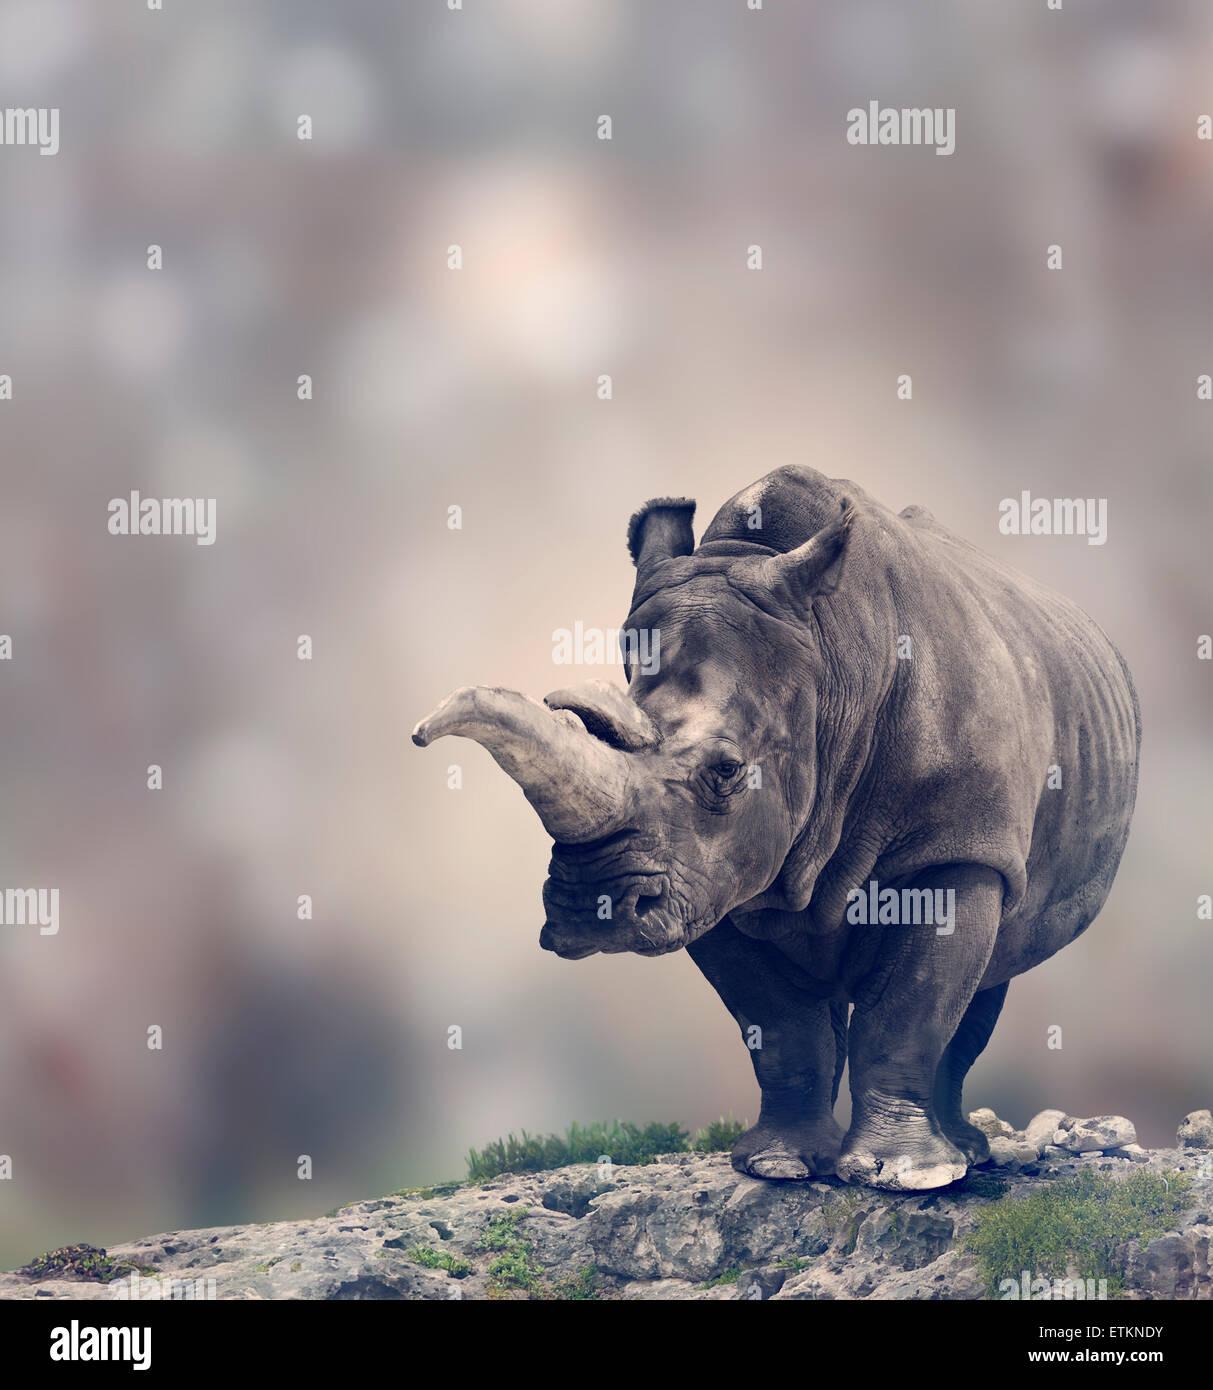 Portrait of Adult White Rhinoceros - Stock Image